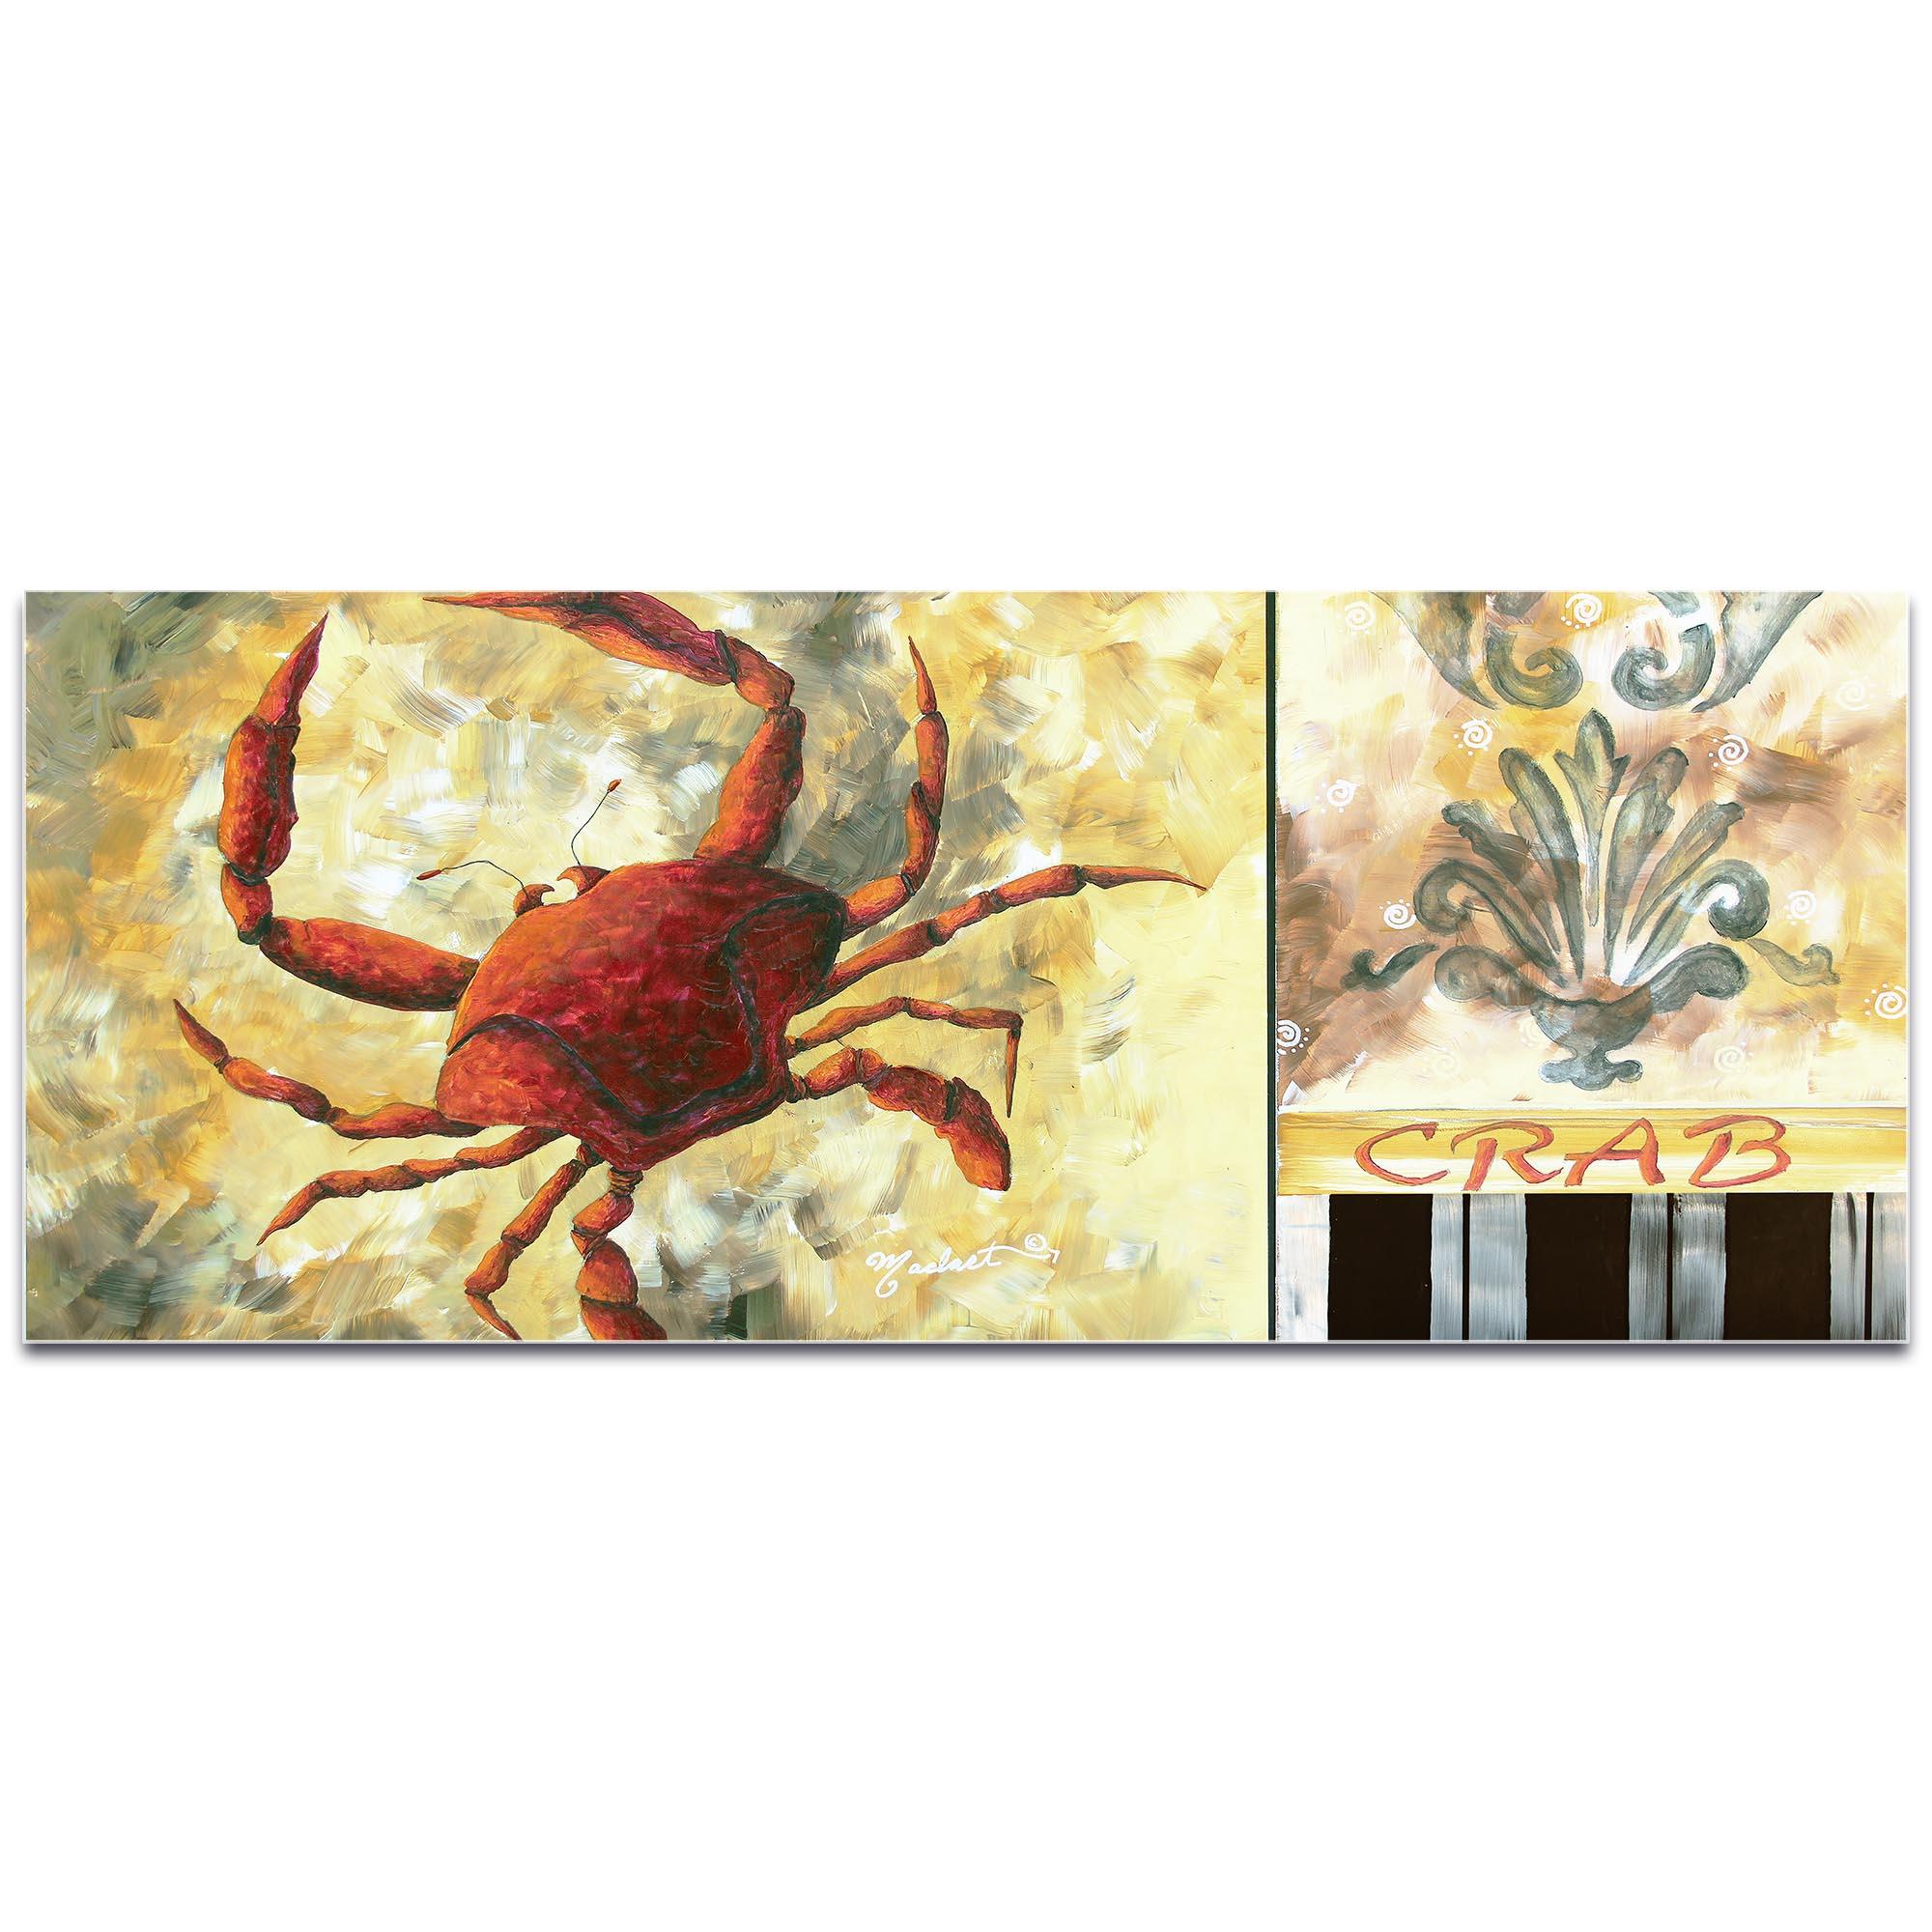 Coastal Decor 'Crab' - Beach Wall Art on Metal or Acrylic - Image 2